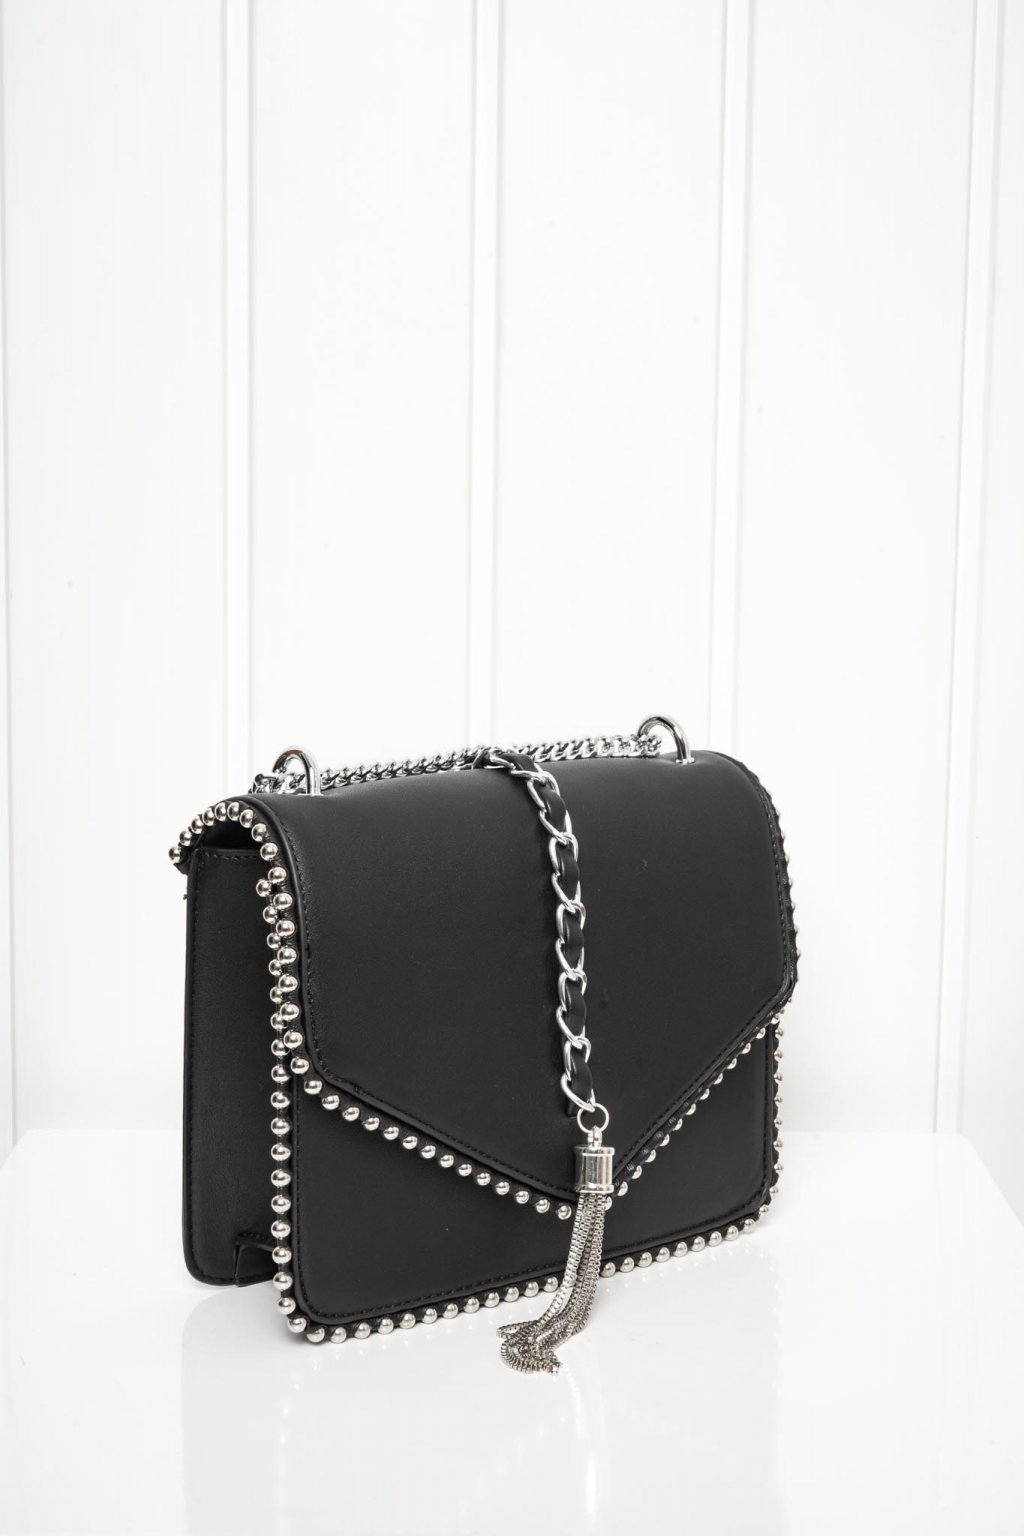 Kabelka, crossbody, ruksak, shopping bag, shopperka, 305